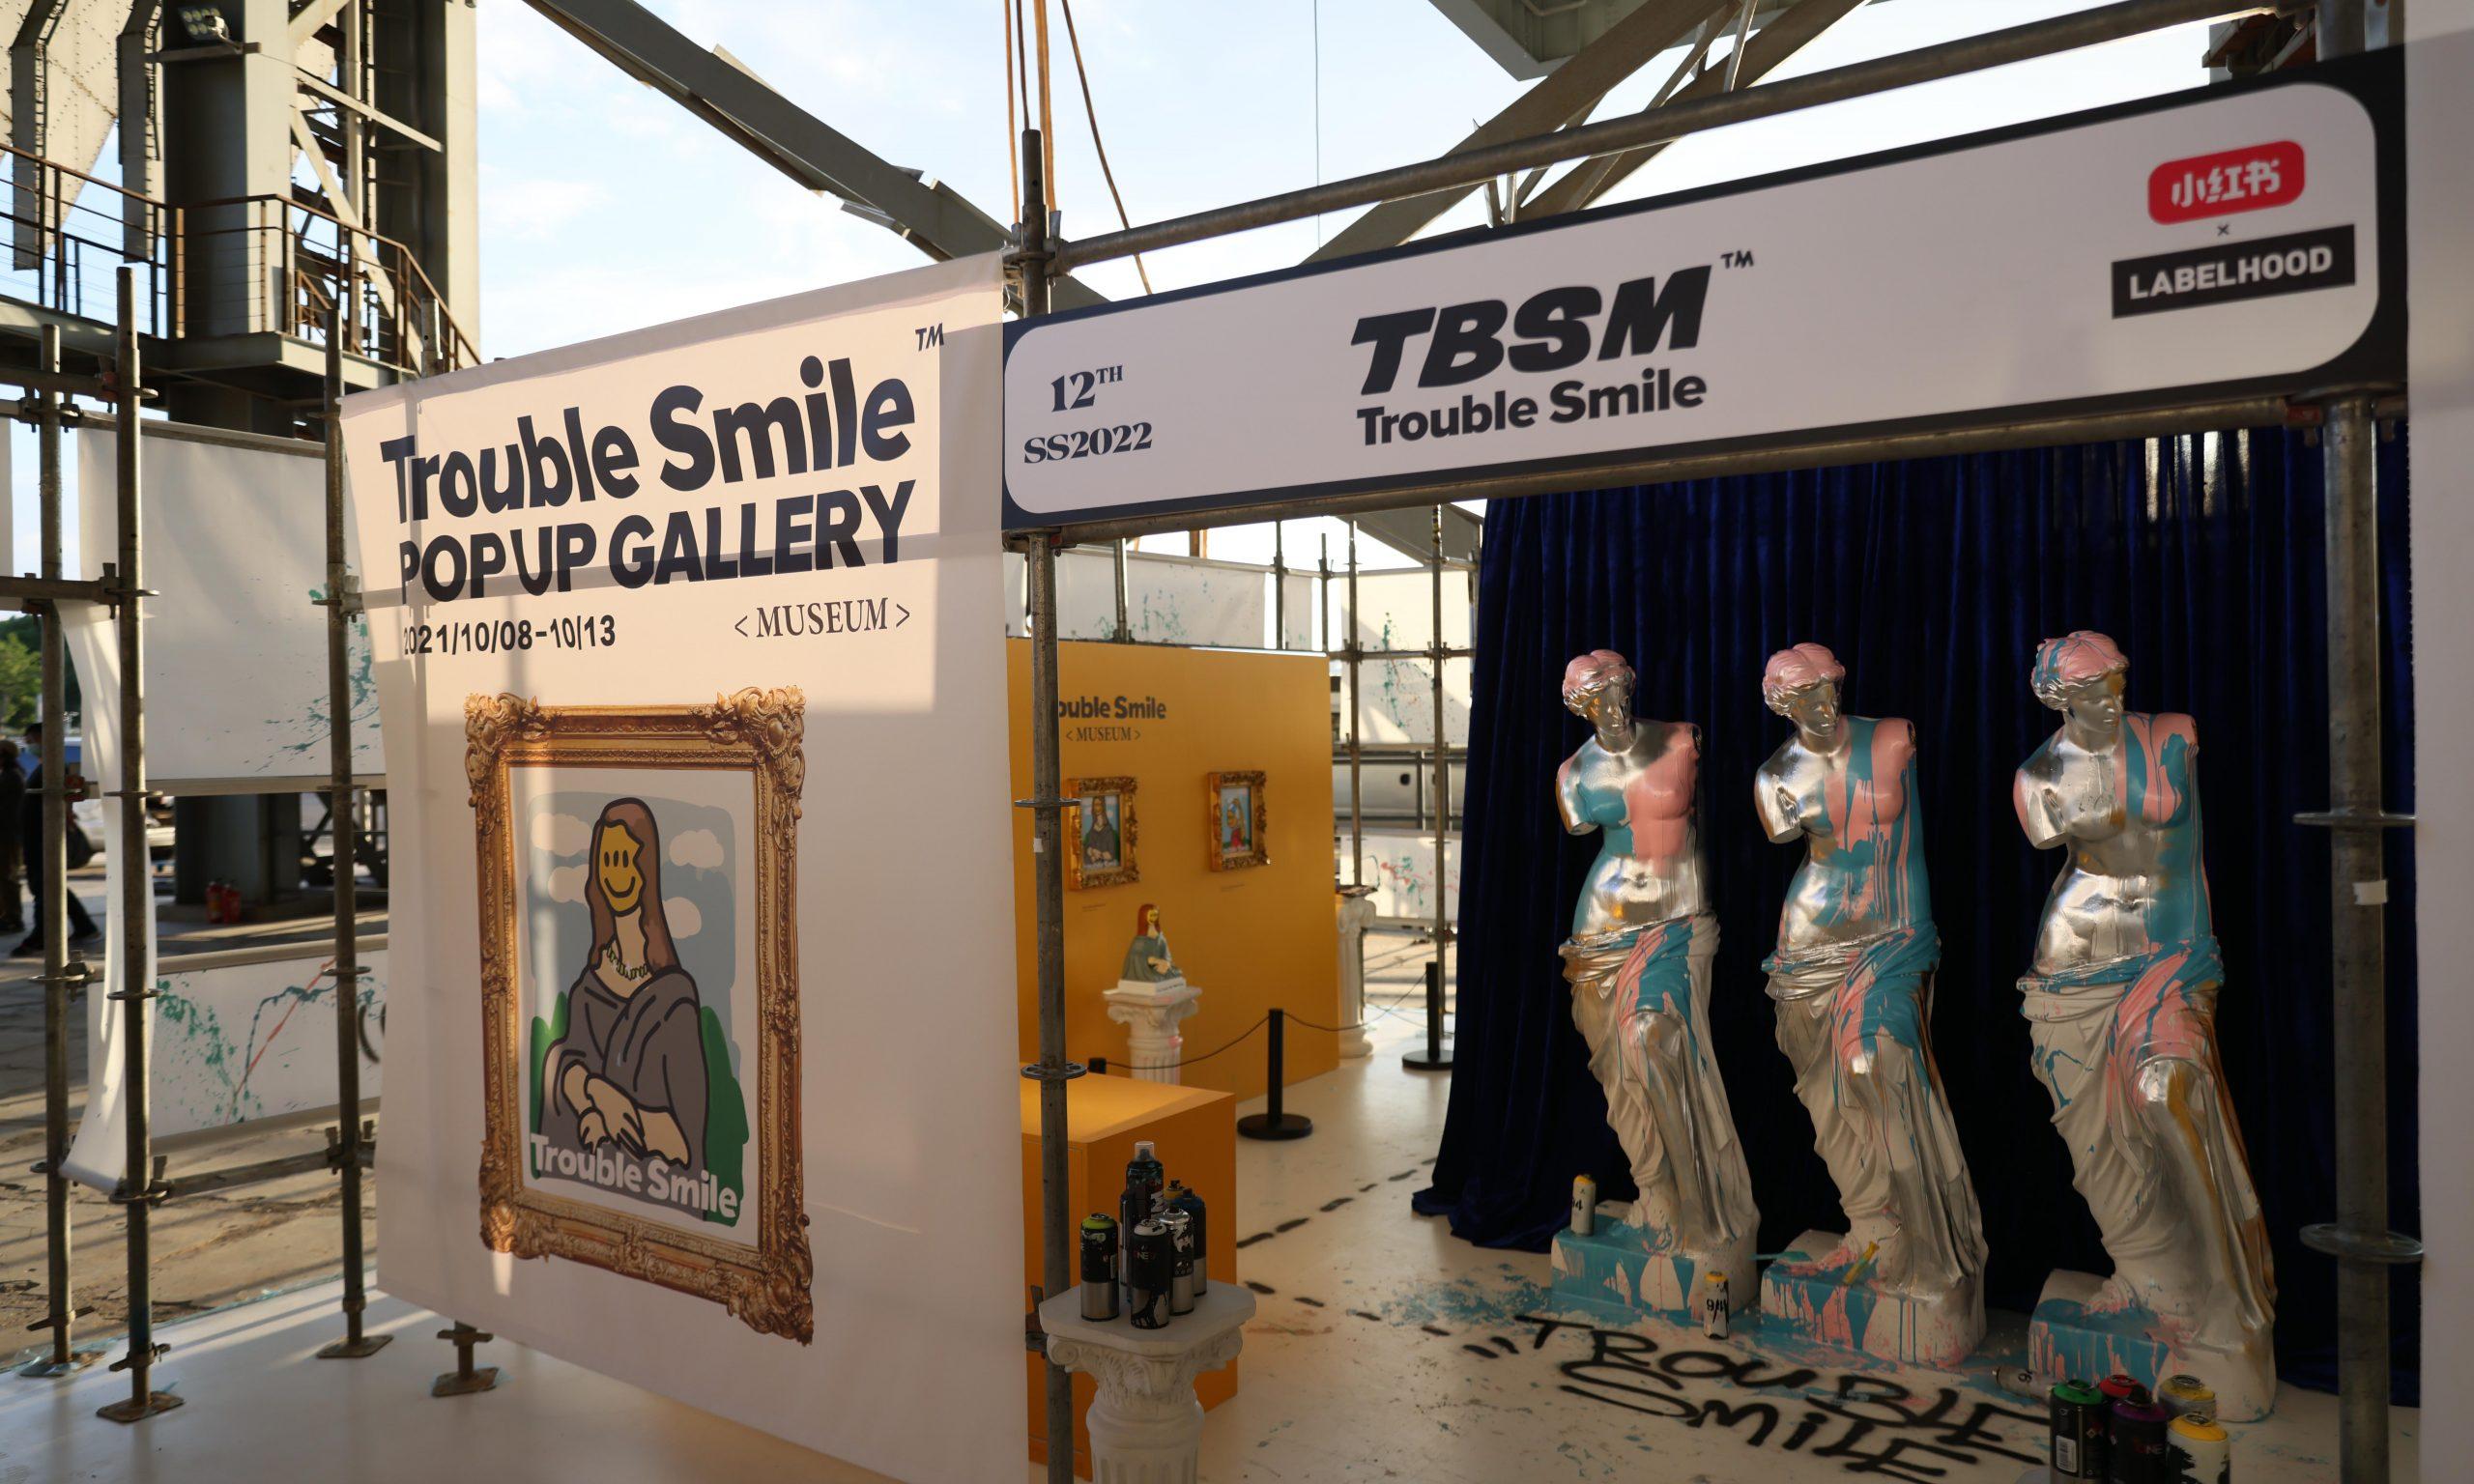 LABELHOOD 蕾虎 2022 春夏系列先锋艺术节正式开幕